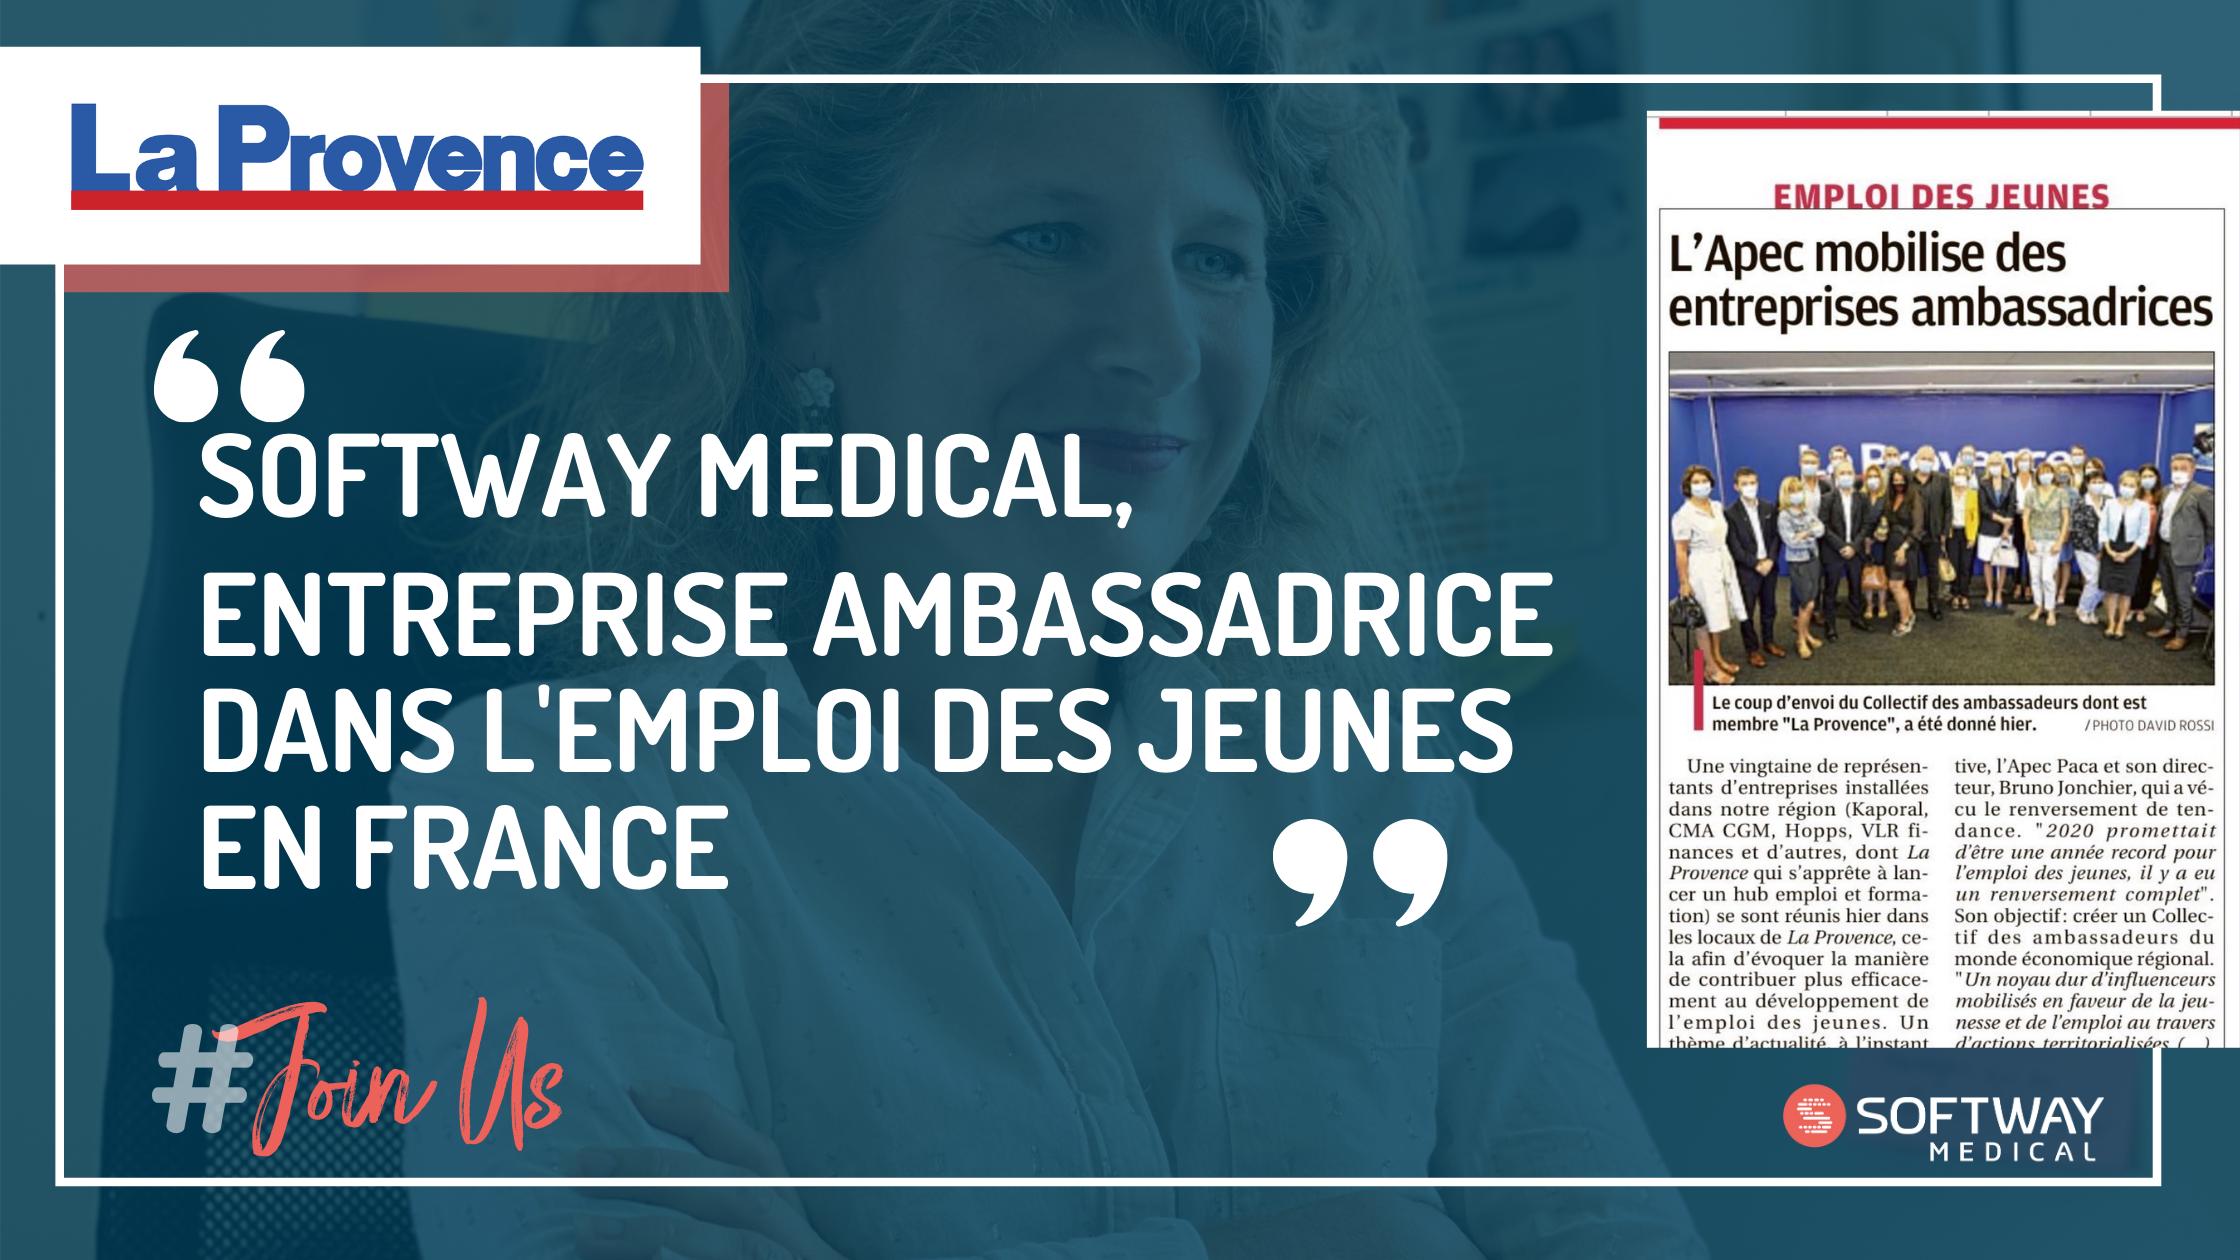 SOFTWAY MEDICAL : ENTREPRISE AMBASSADRICE DANS L'EMPLOI DES JEUNES EN FRANCE